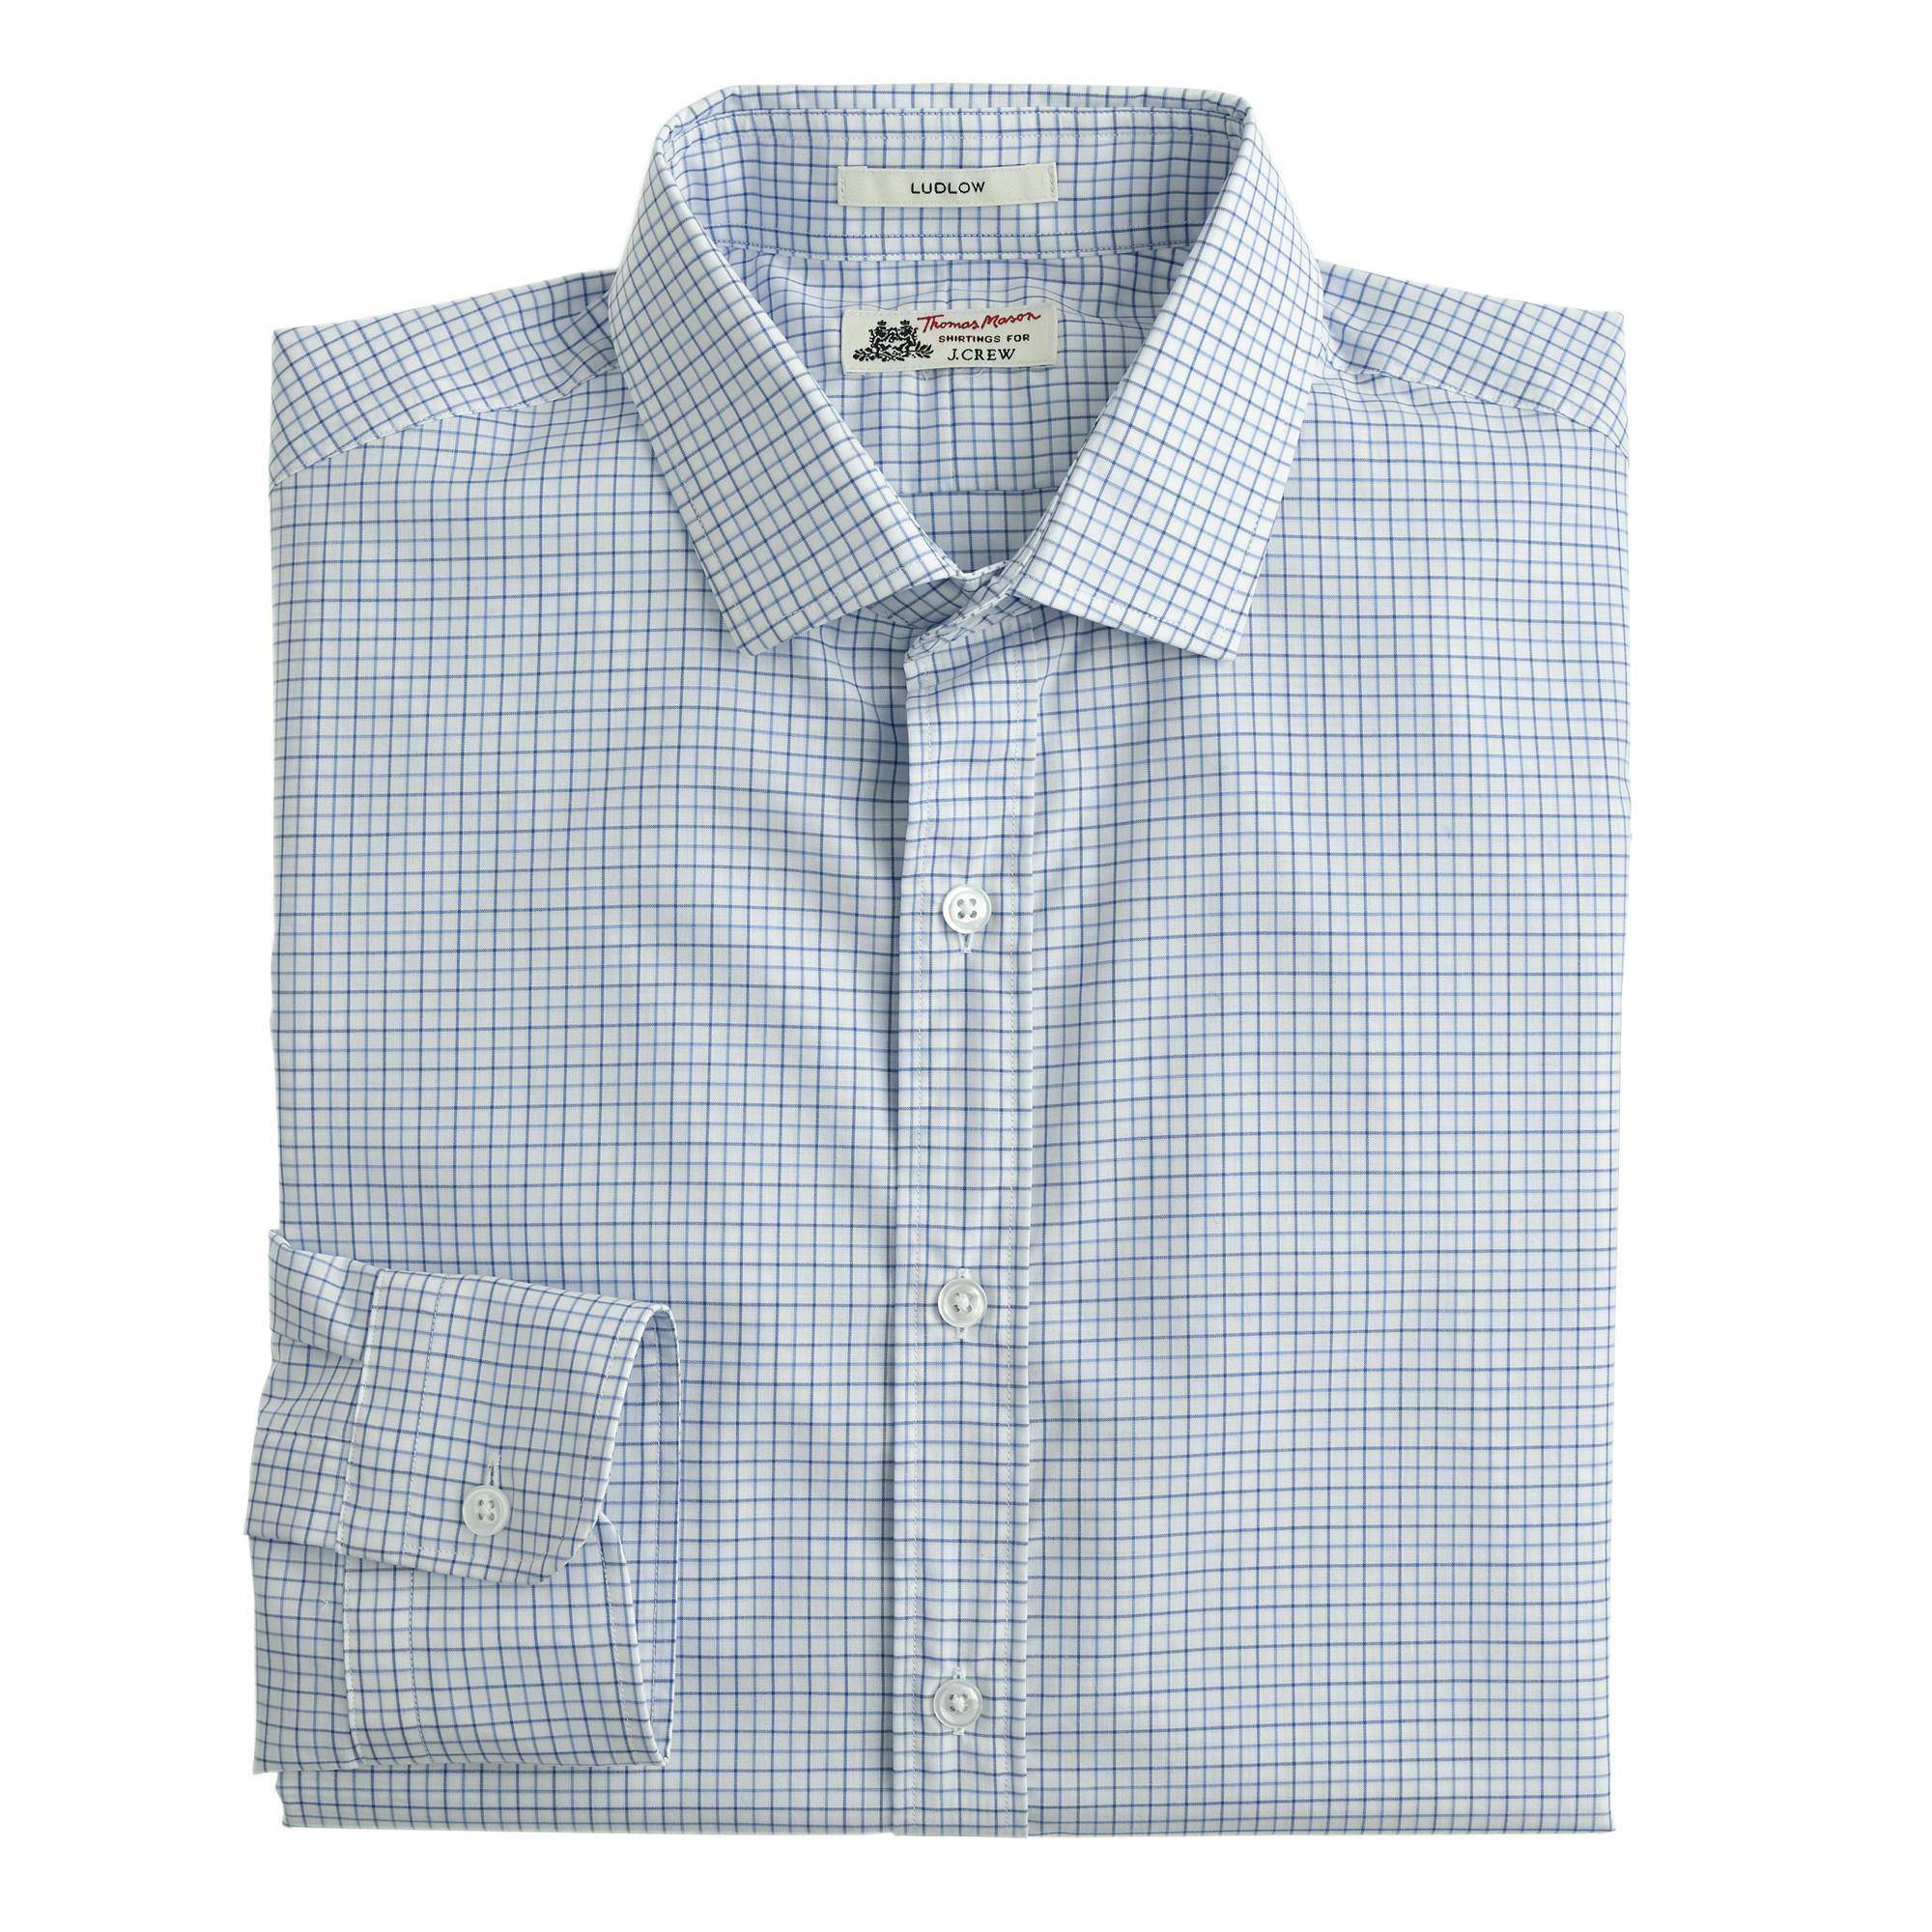 Thomas mason ludlow shirt in fresh pond tattersall for Mason s men s shirts